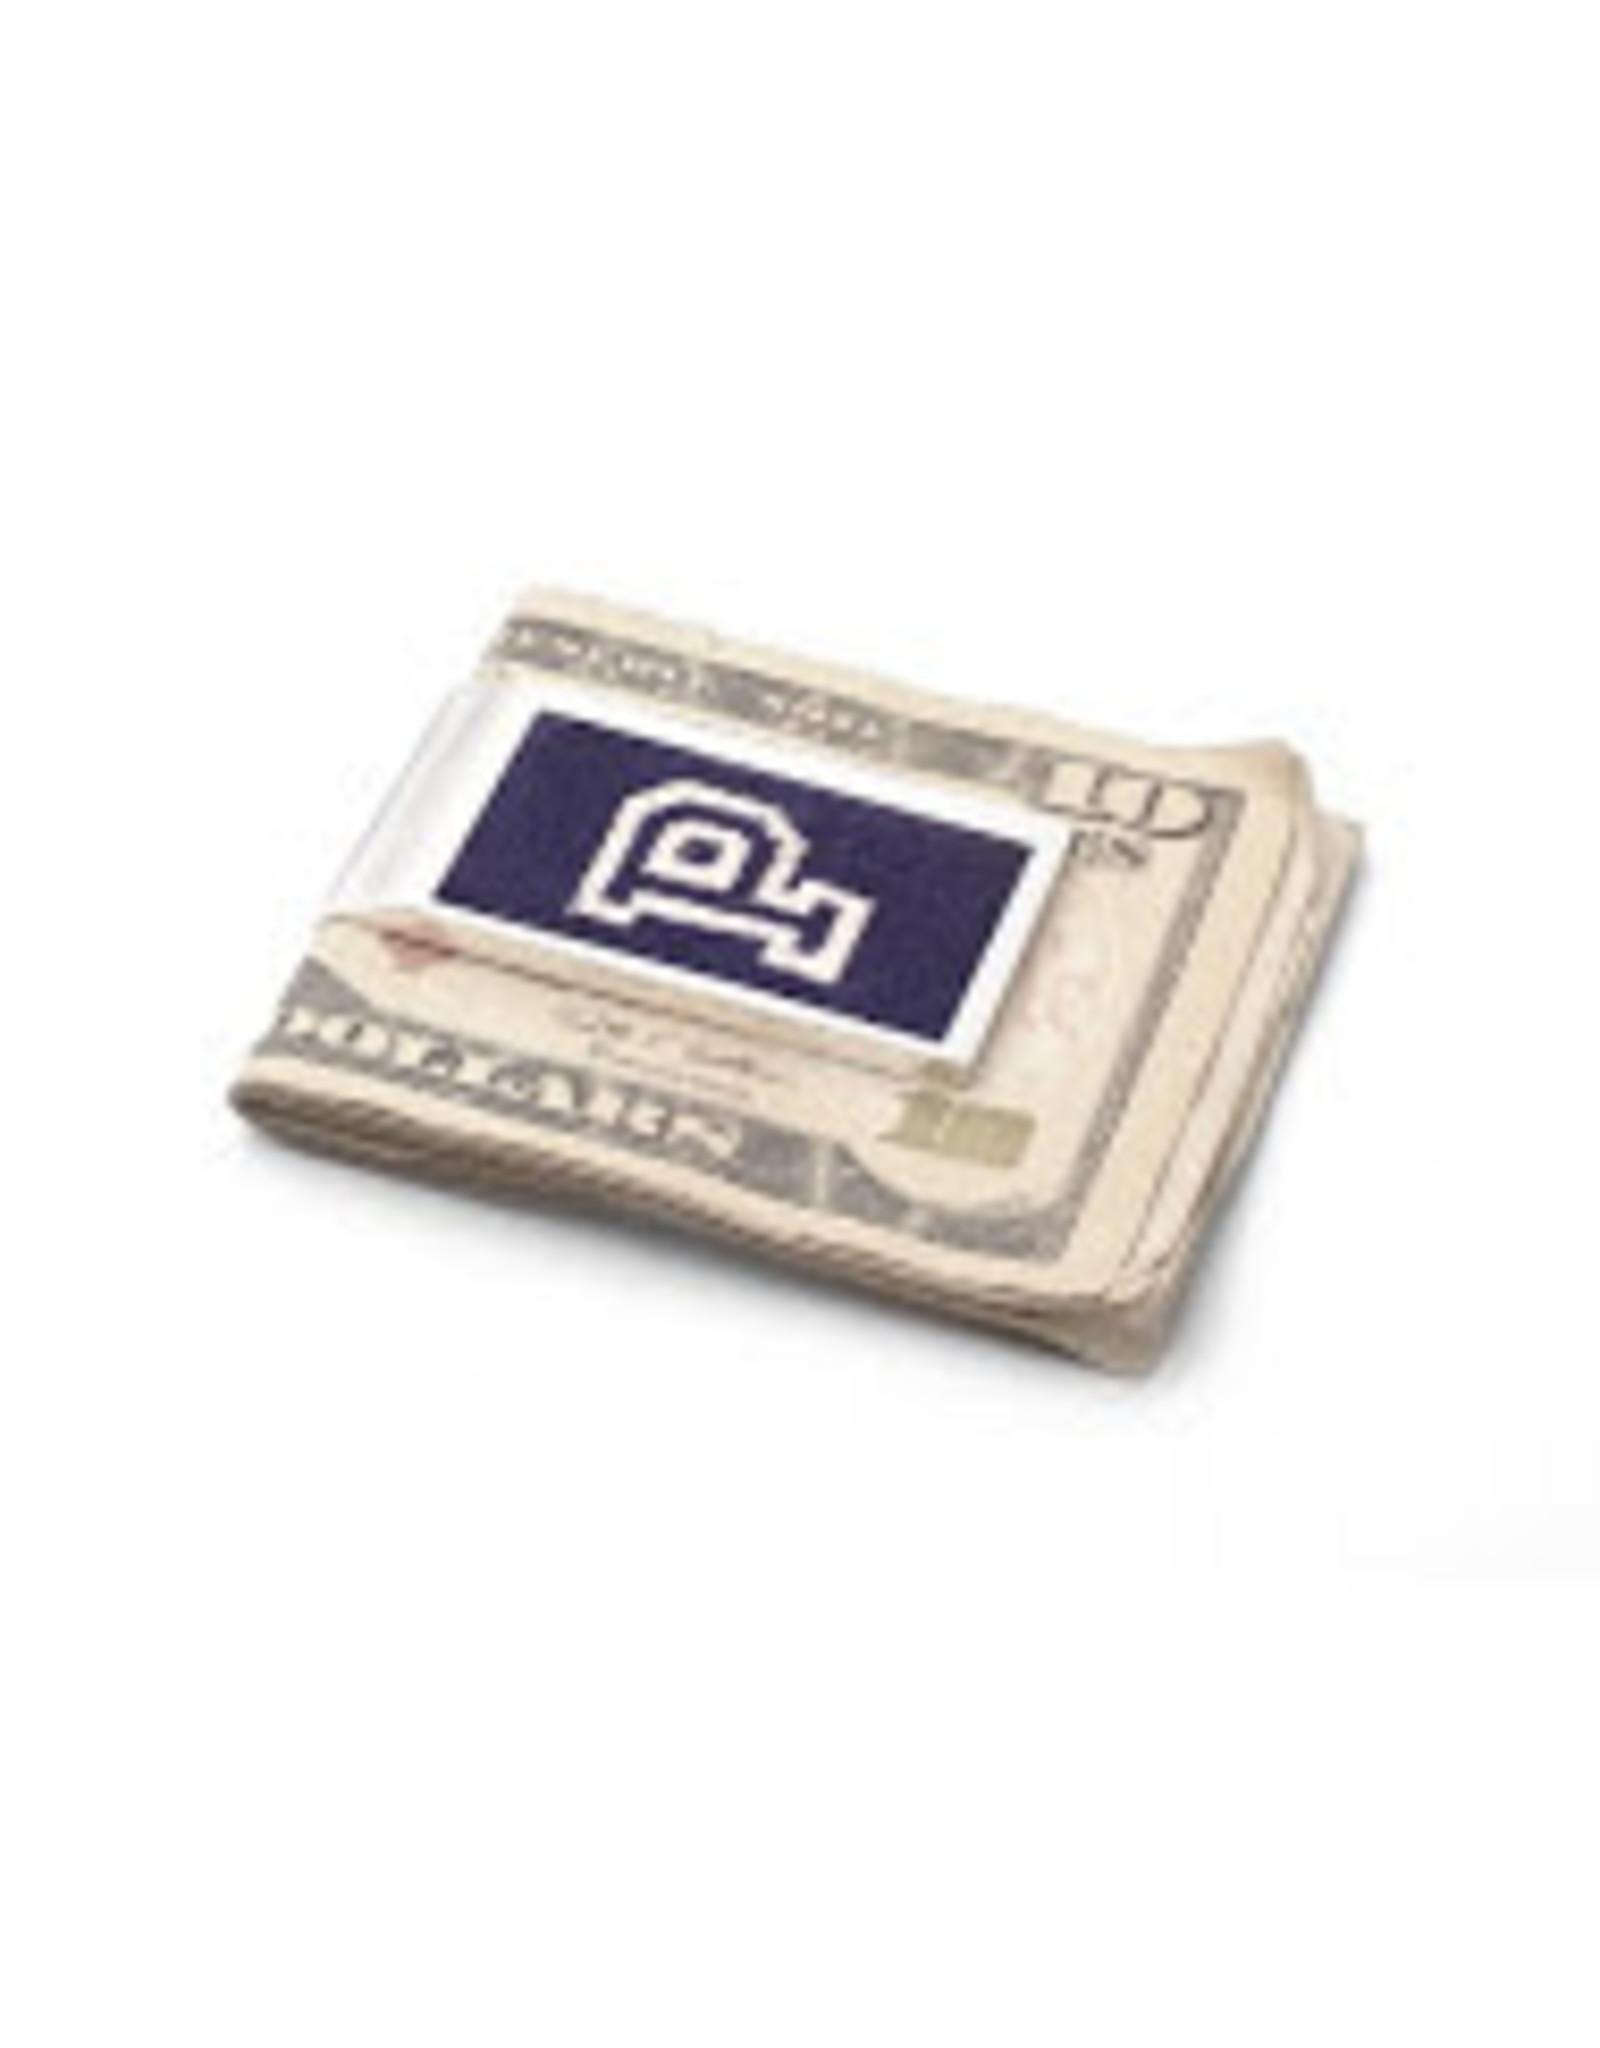 Money Clip-Smathers & Branson-Silver-1 x 2.25